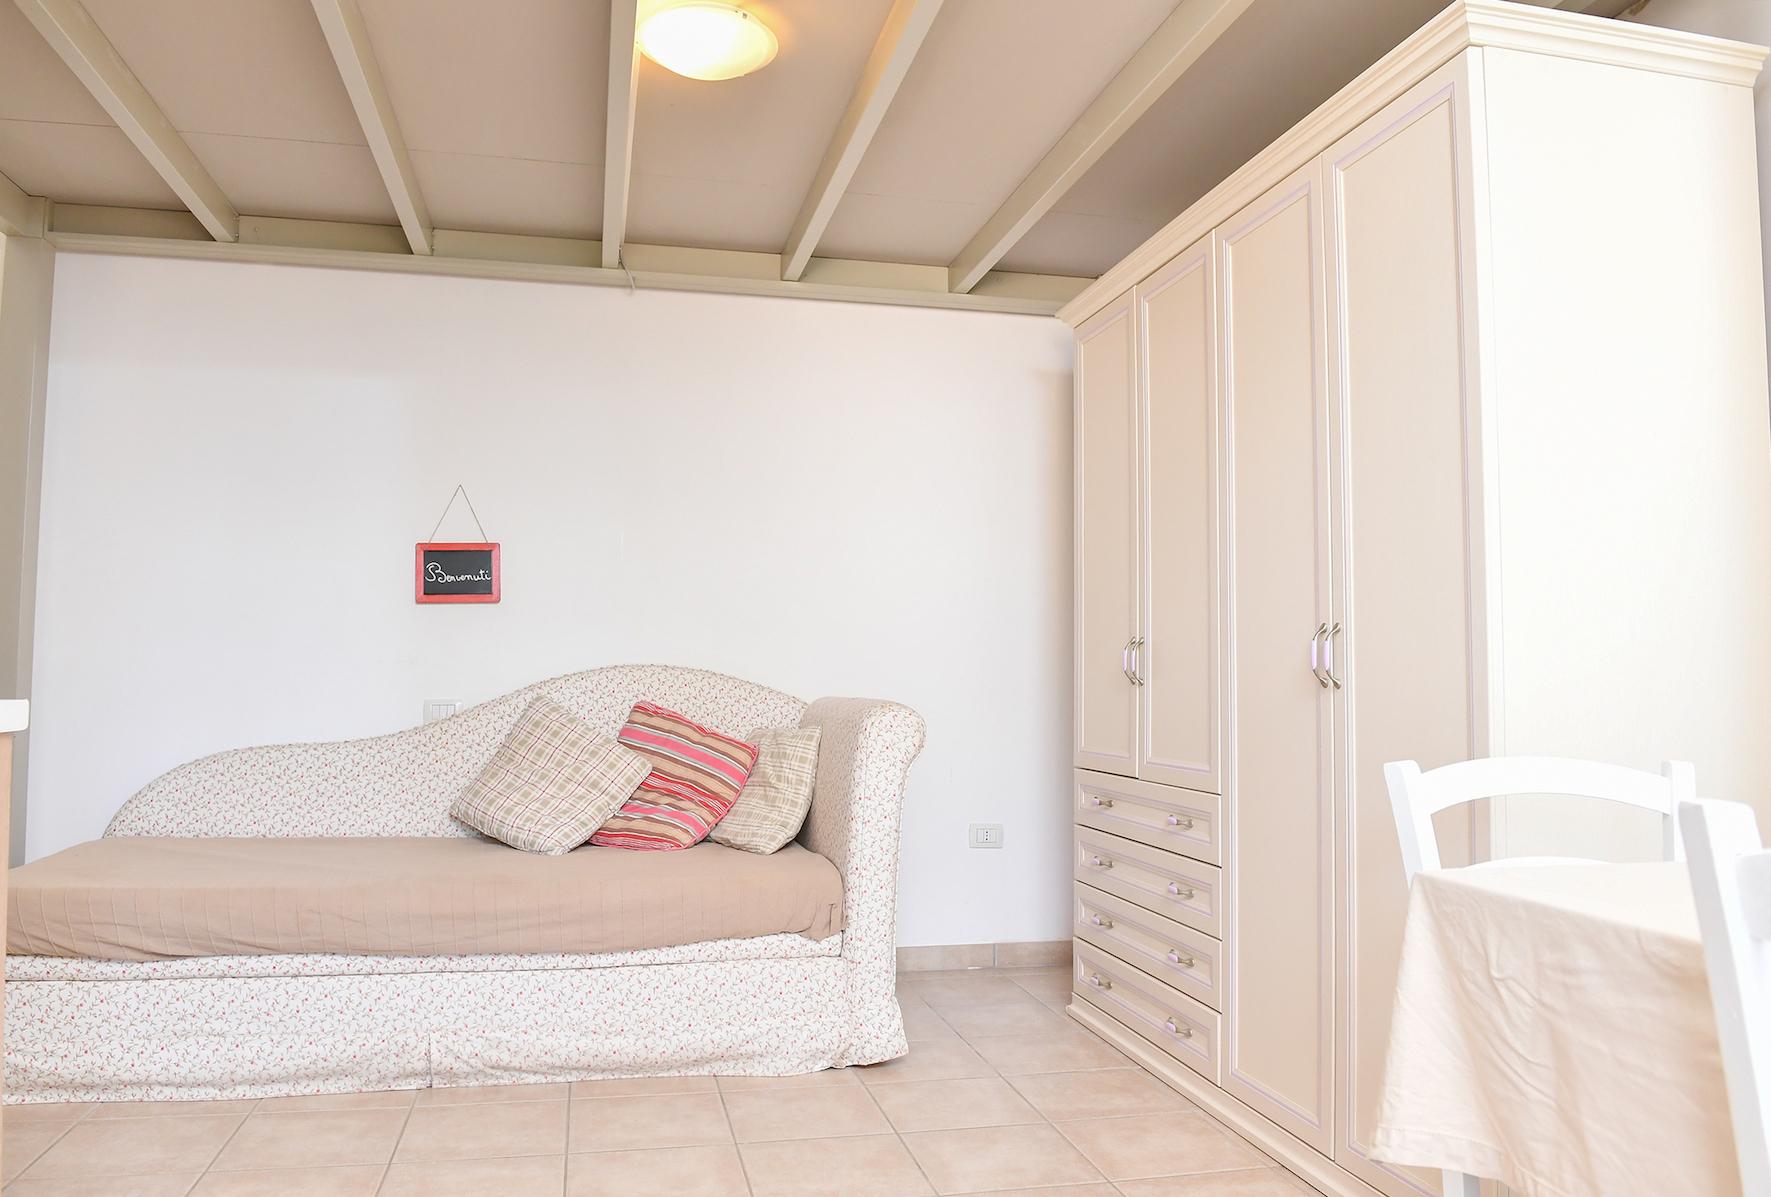 Lecce 8 - Lounge